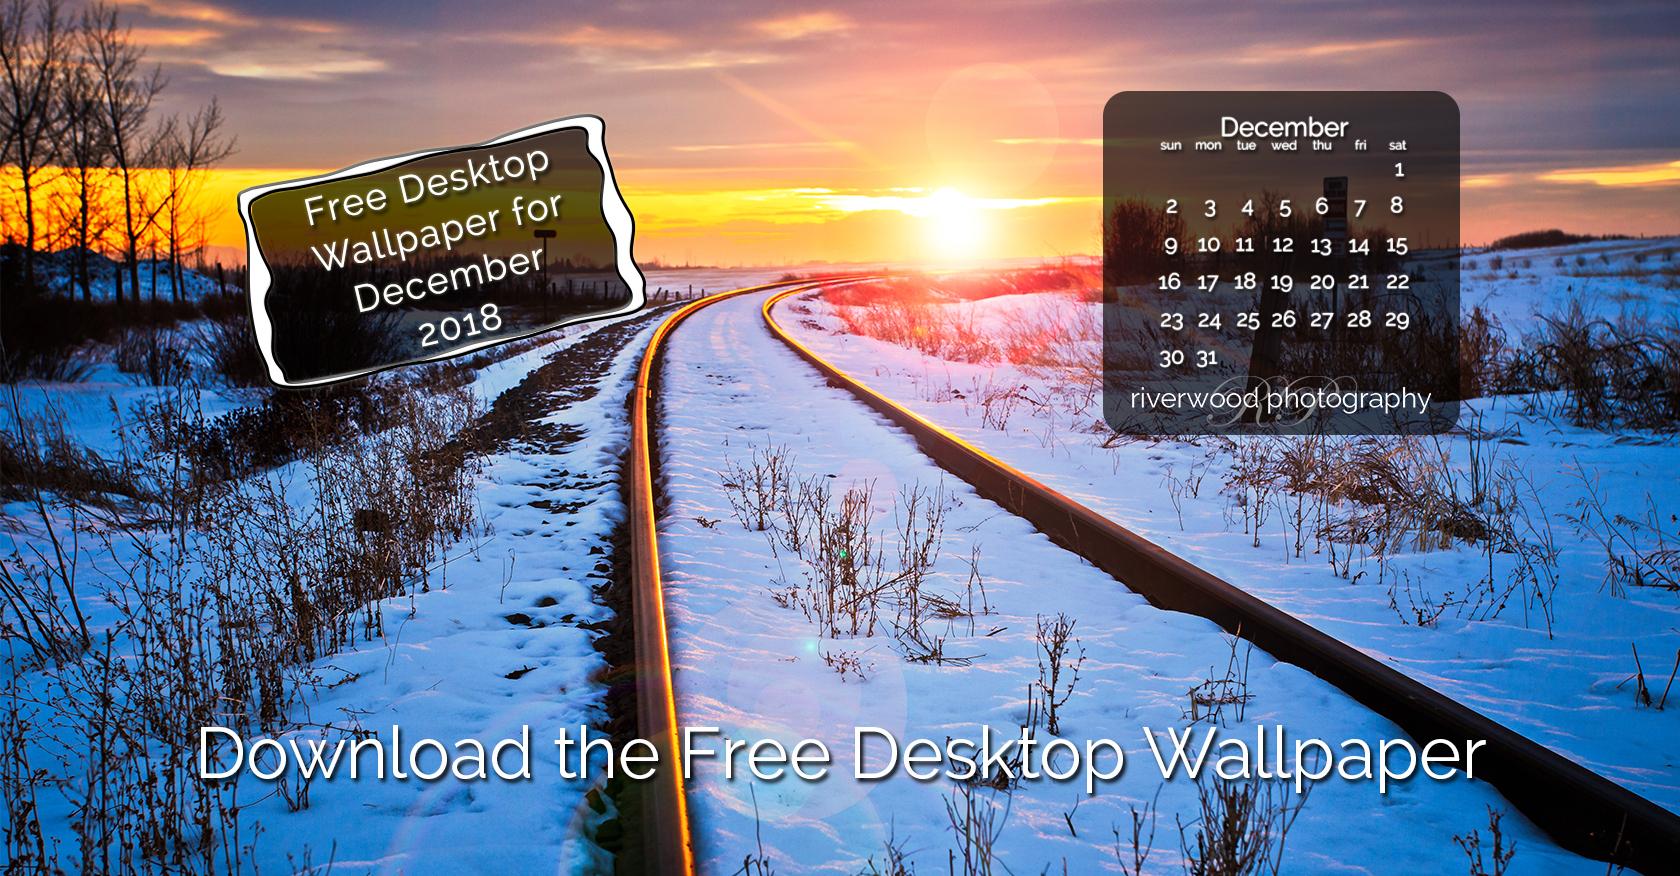 Free Desktop Wallpaper for December 2018 – Railway Sunset